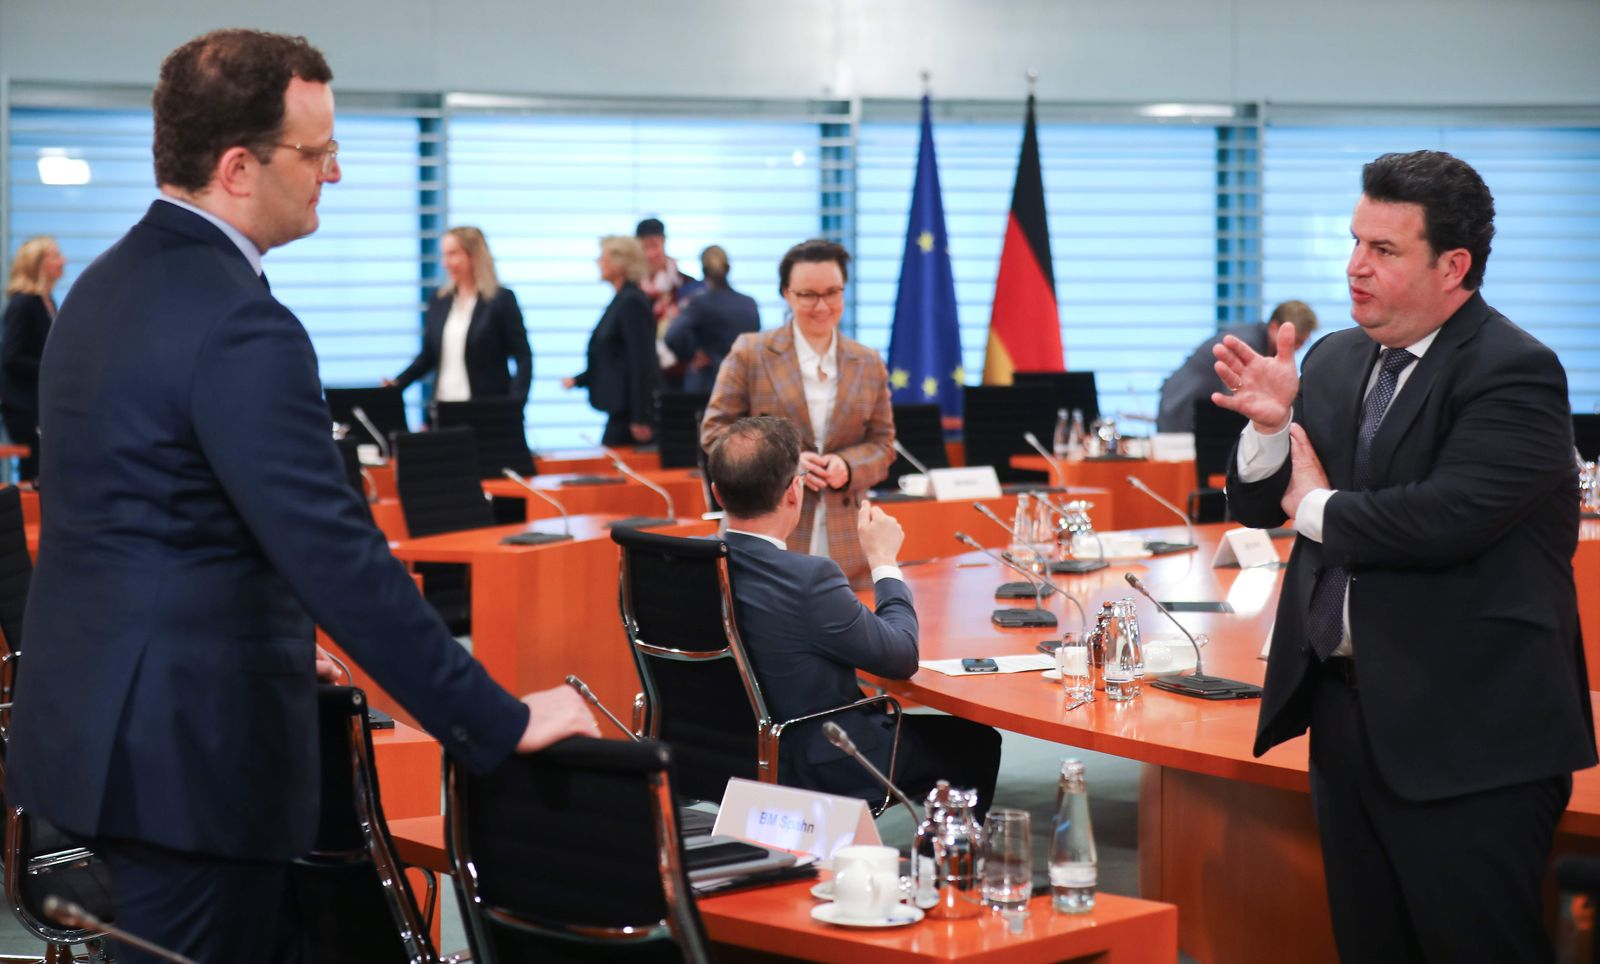 GERMANY-POLITICS-CABINET-HEALTH-VIRUS